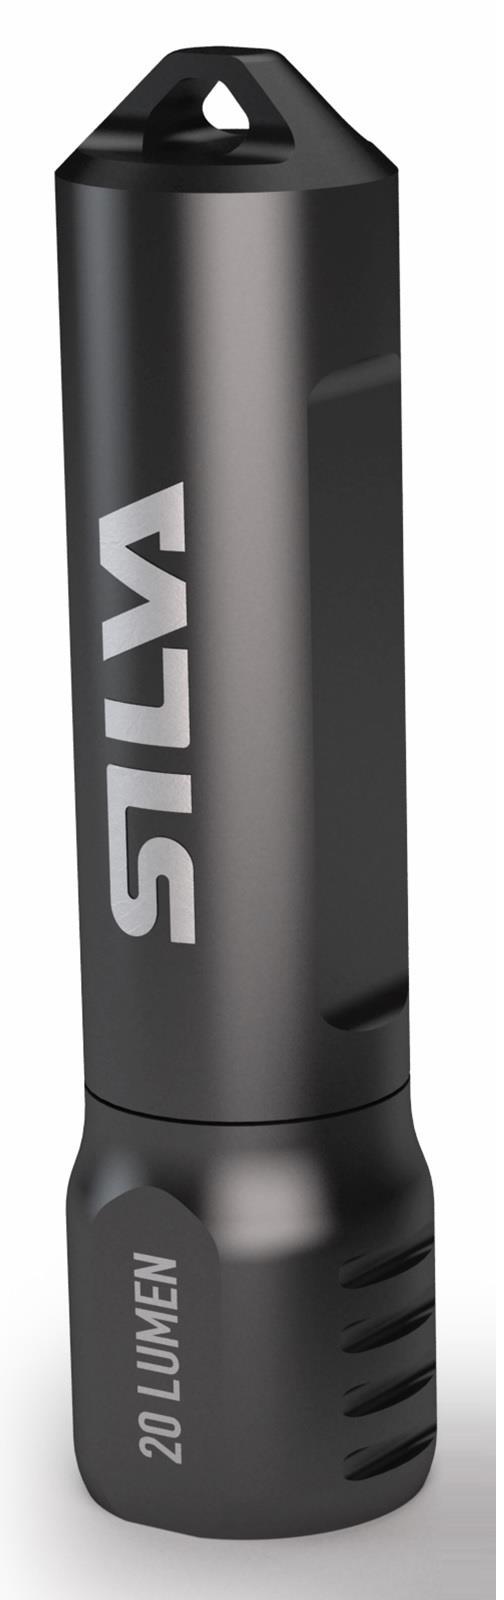 Silva Topo Mini El Feneri 20lm 20m SV37704 0247